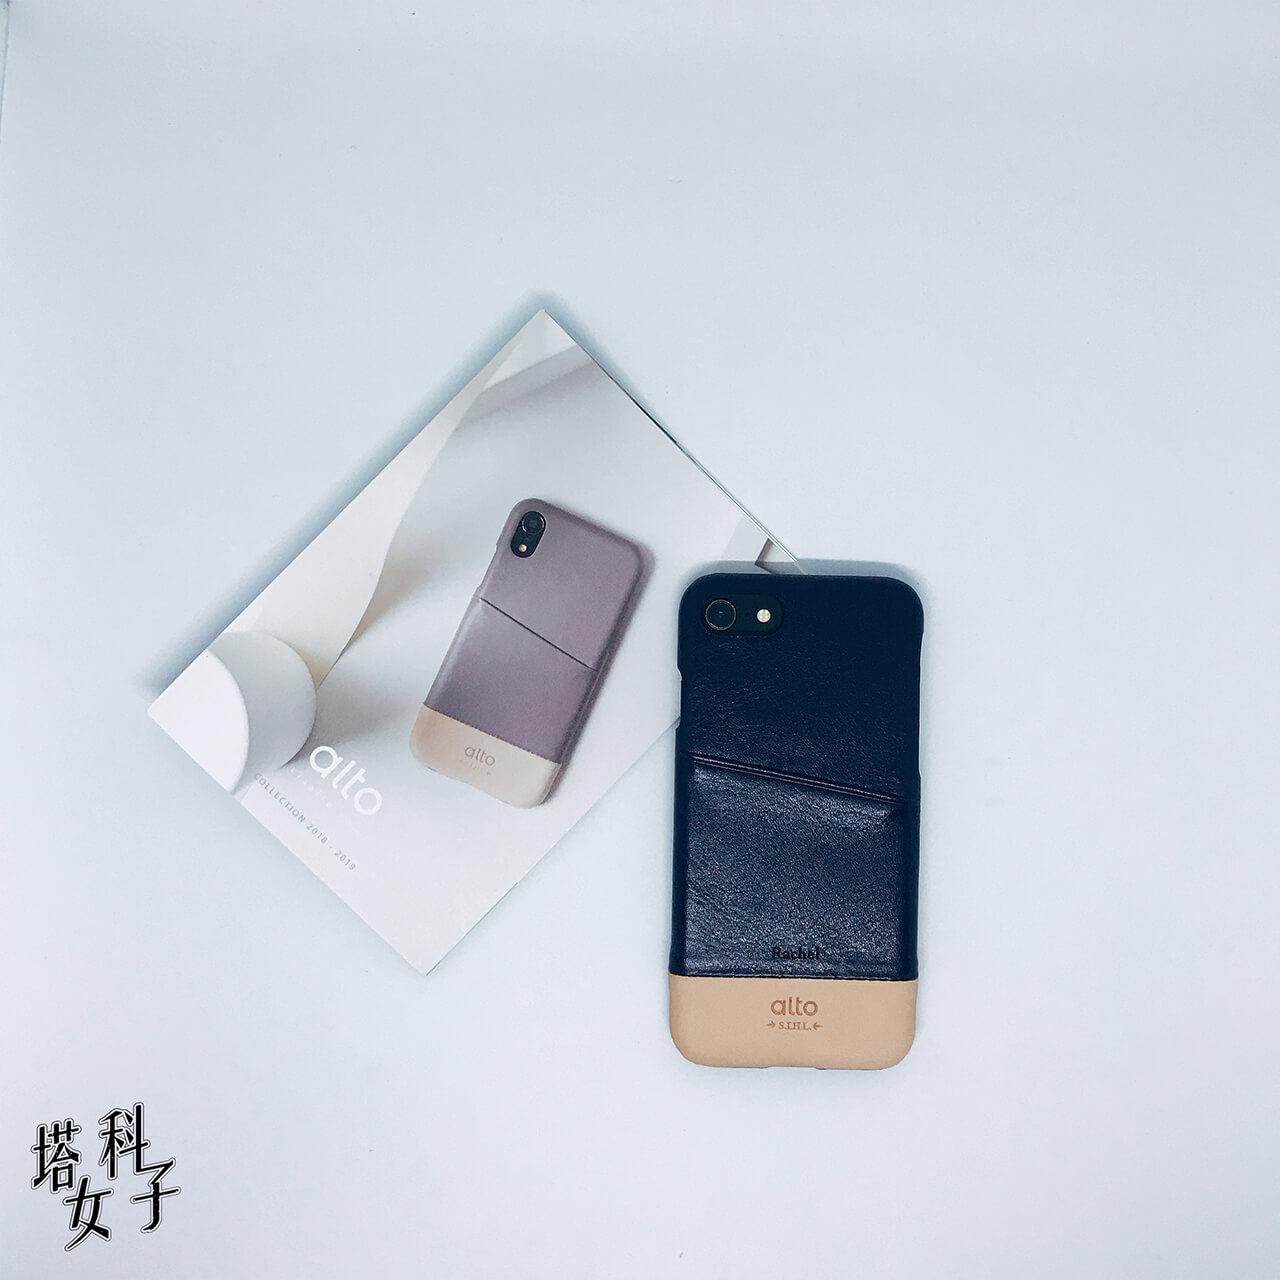 iPhone 手機殼推薦 - alto